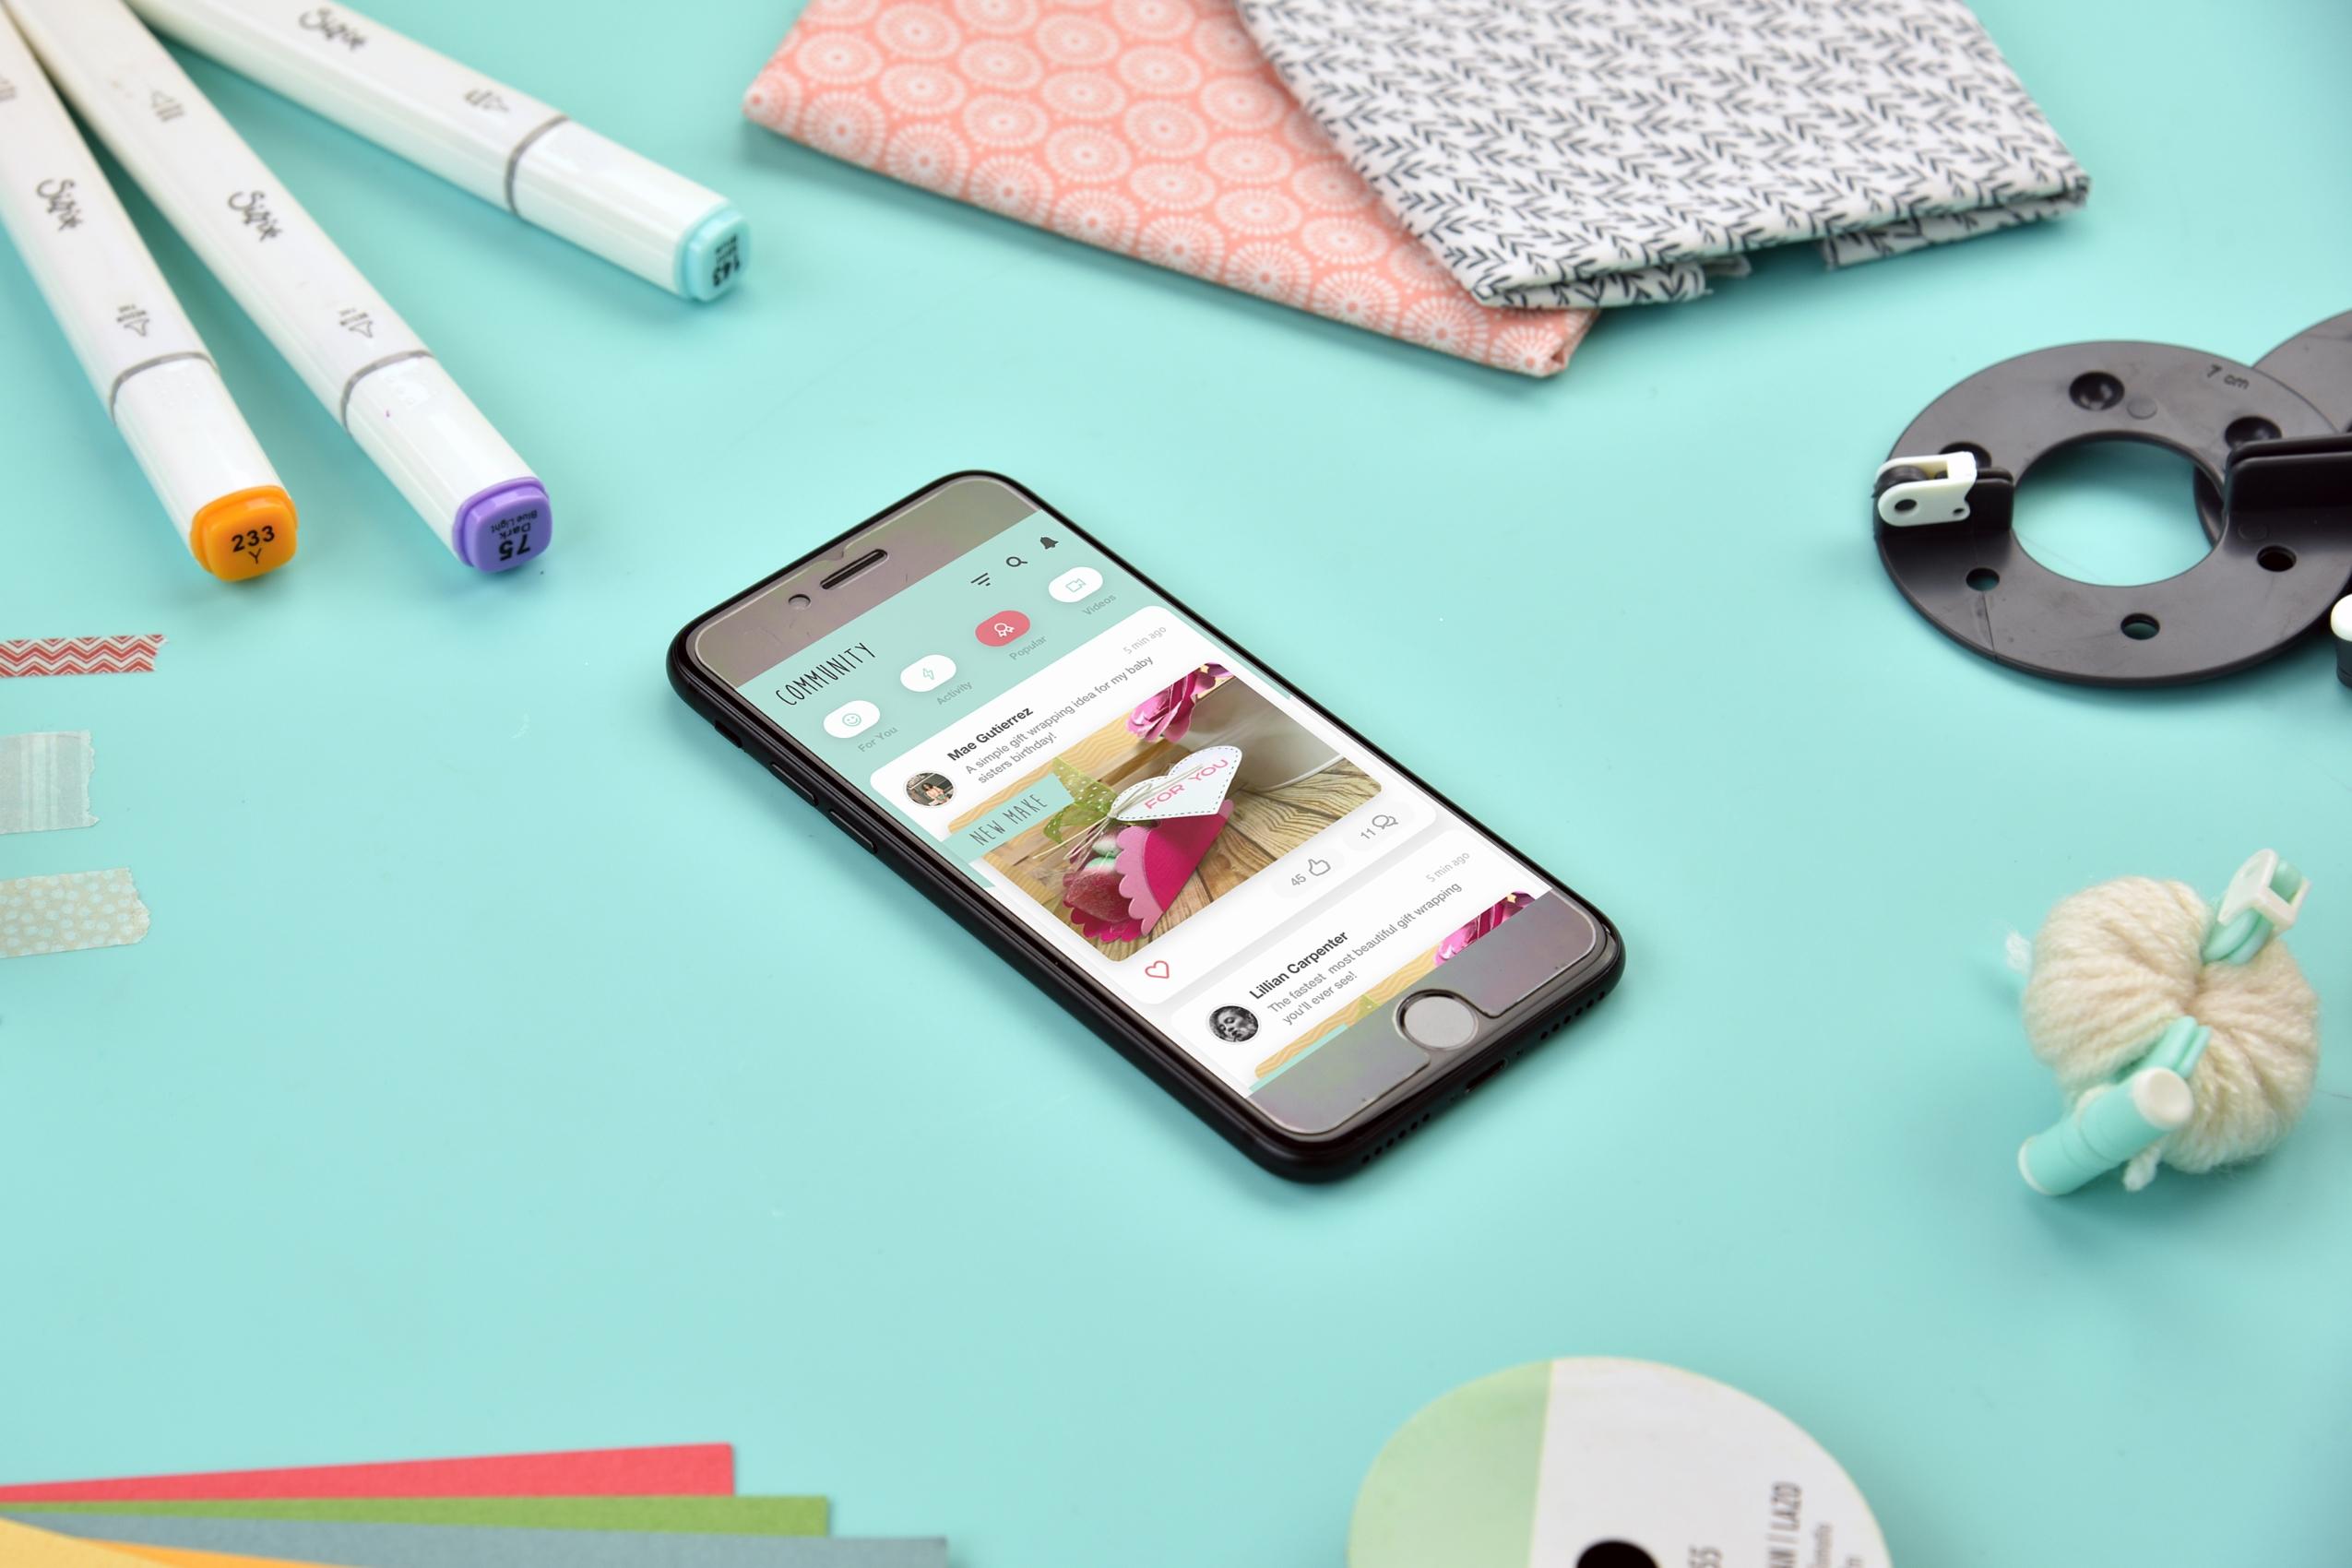 Sizzix app launch